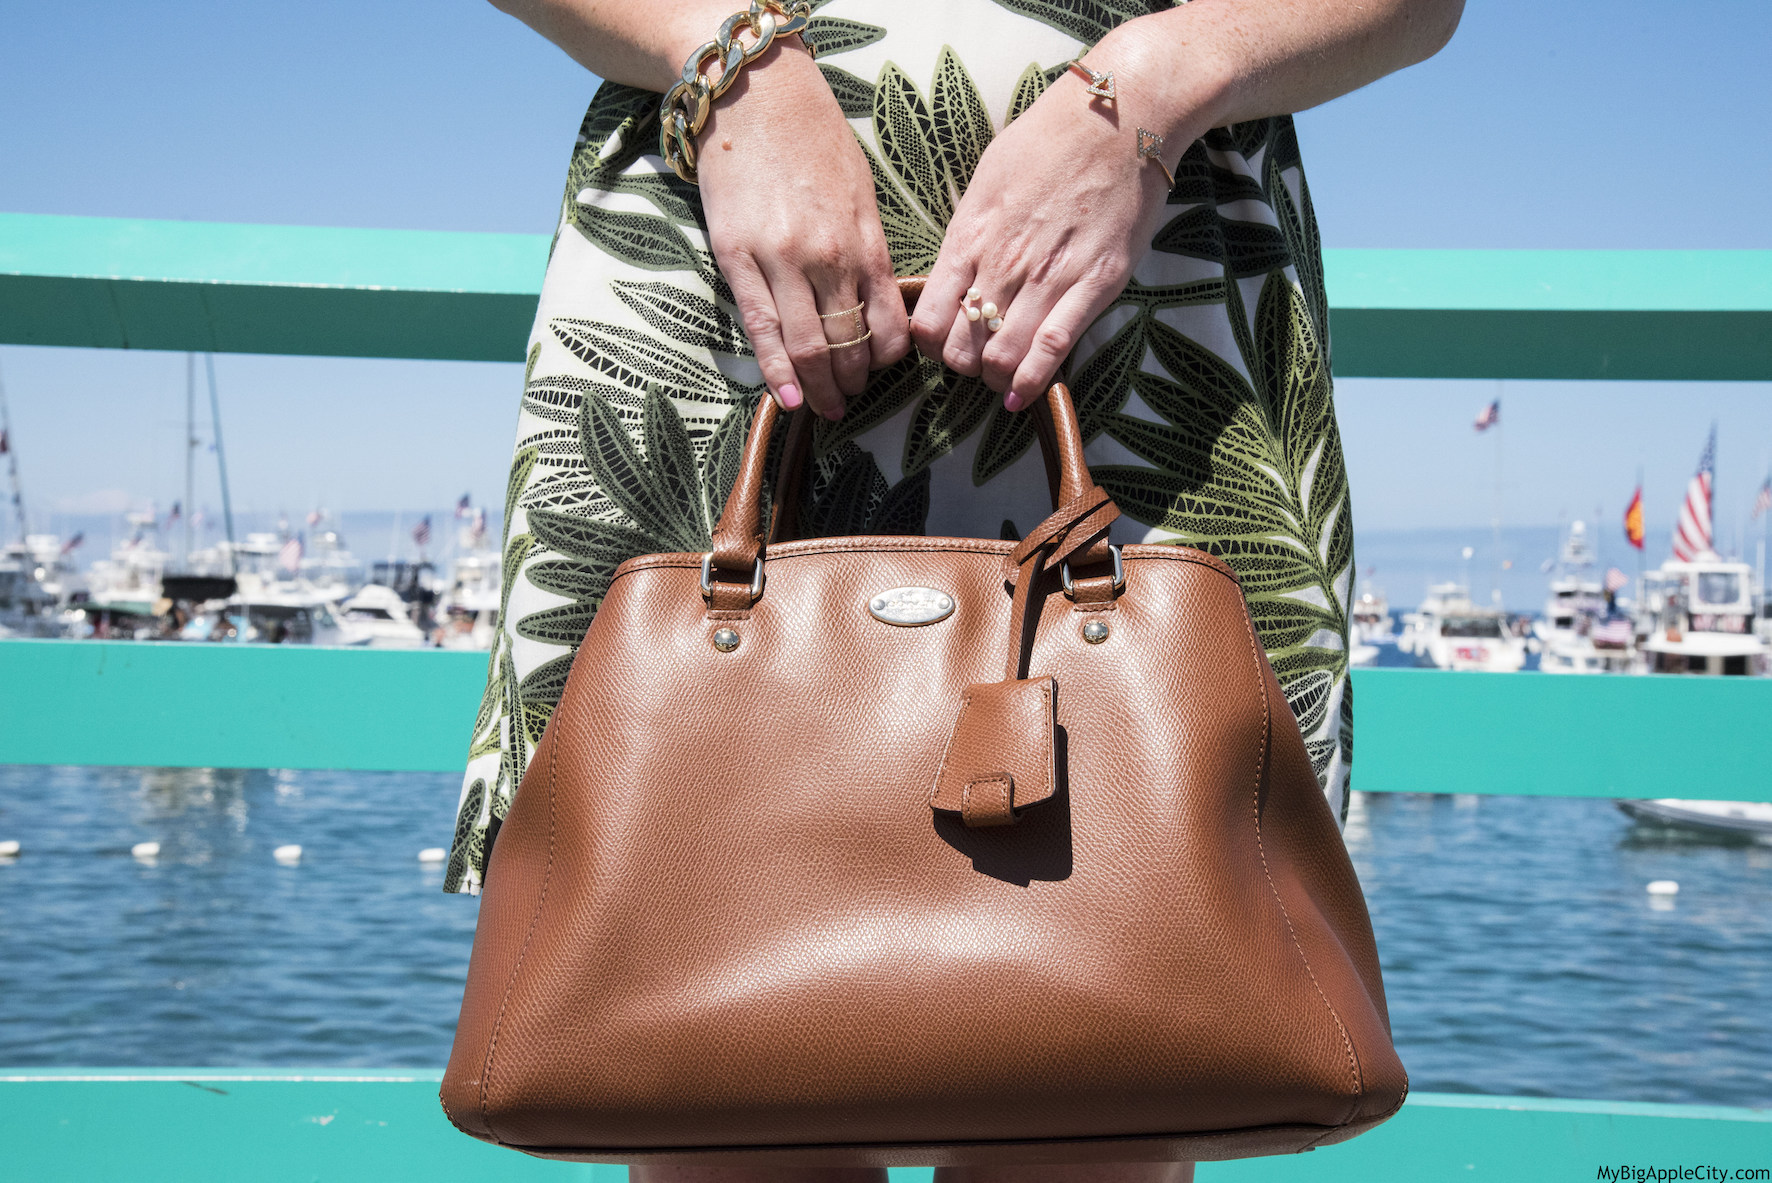 Coach-bag-OOTD-Fashion-Blogger-2015-MyBigAppleCity